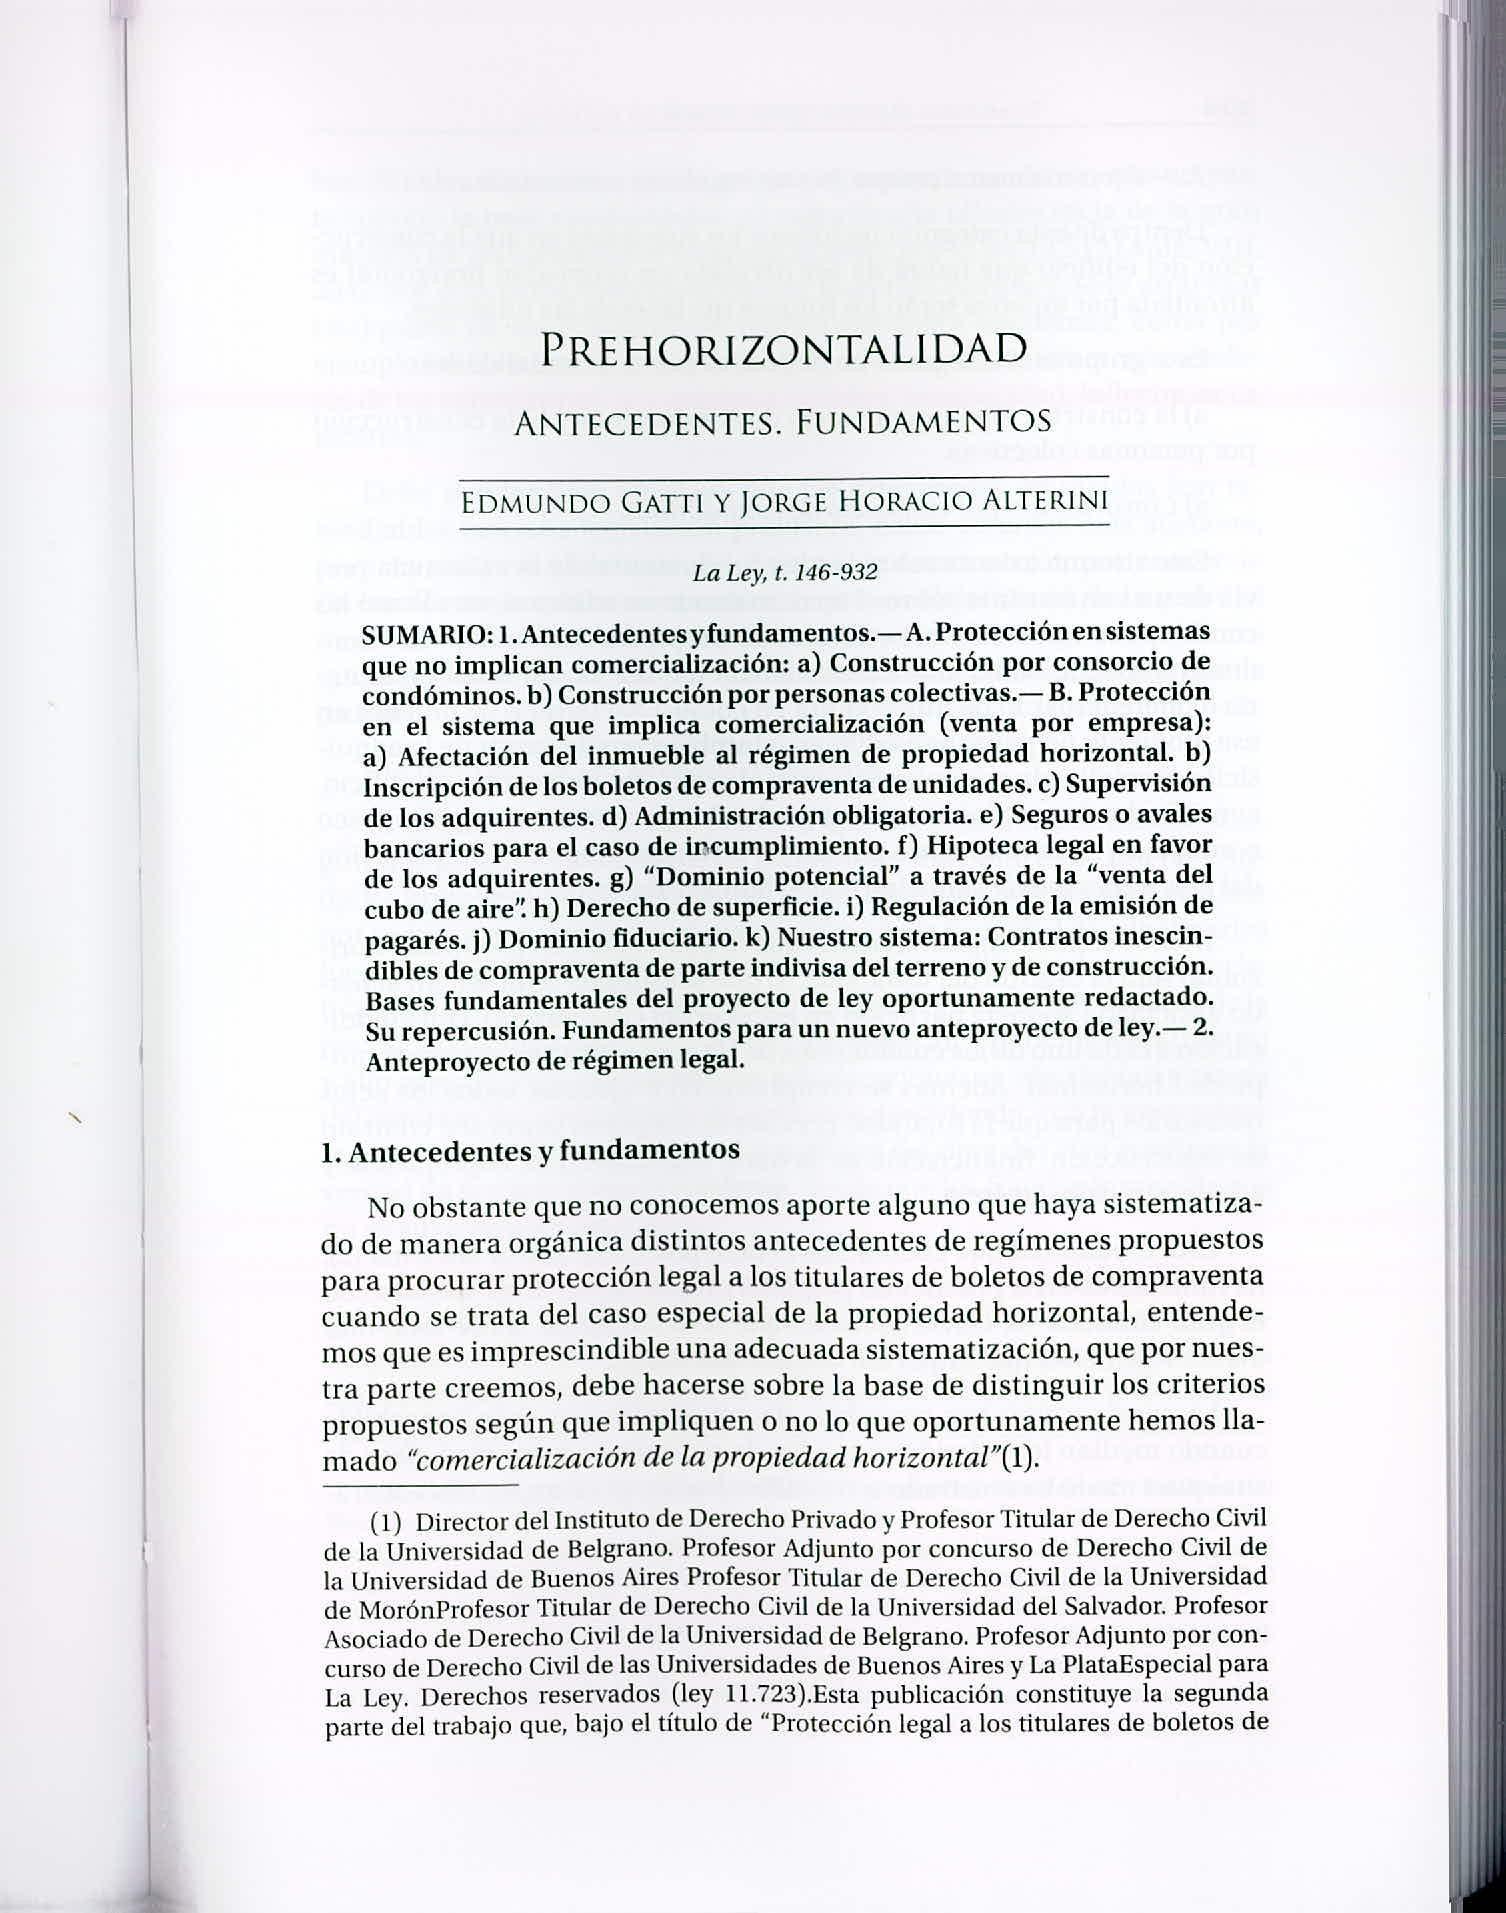 Index Of Greenstone Collect Salagr Index Assoc Hash01da Dir # Muebles Cival Ltda